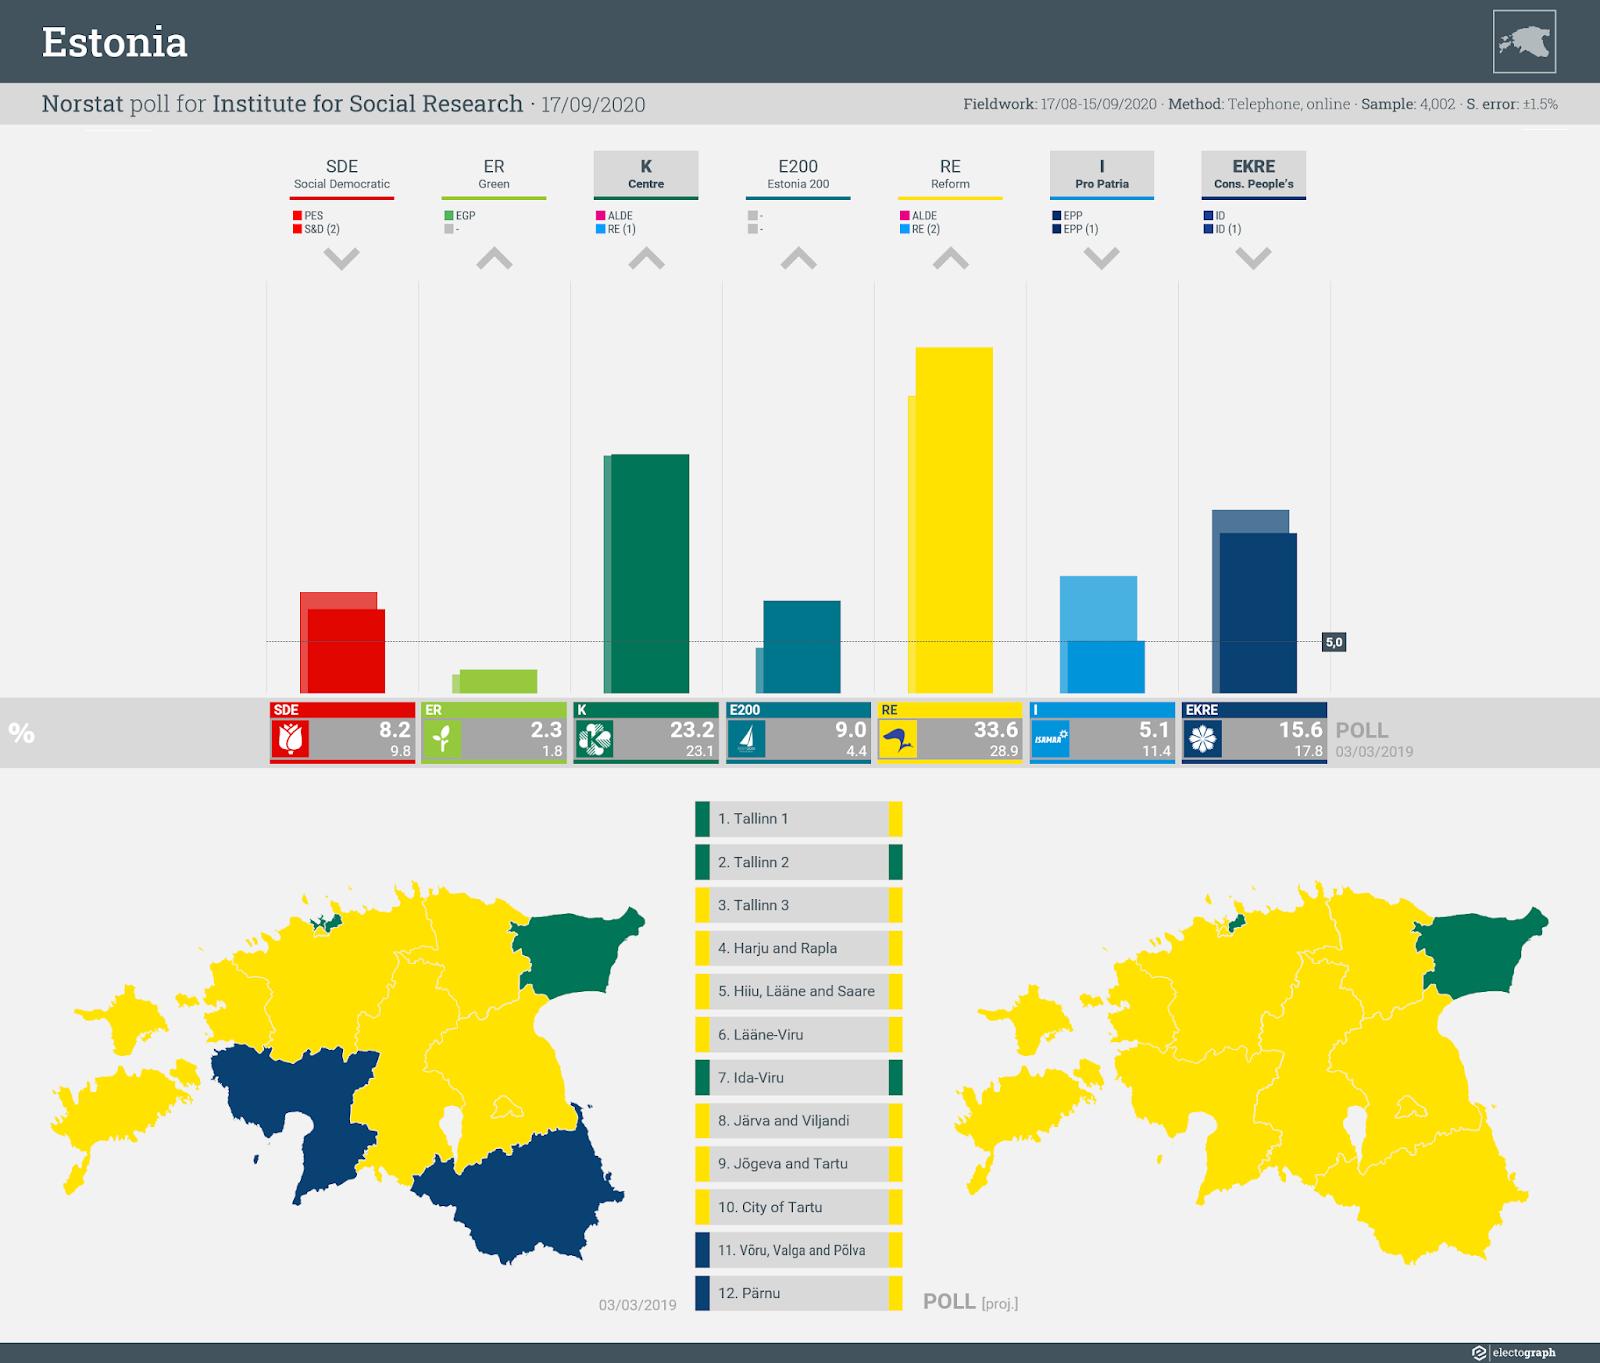 ESTONIA: Norstat poll chart for Institute for Social Research, 17 September 2020